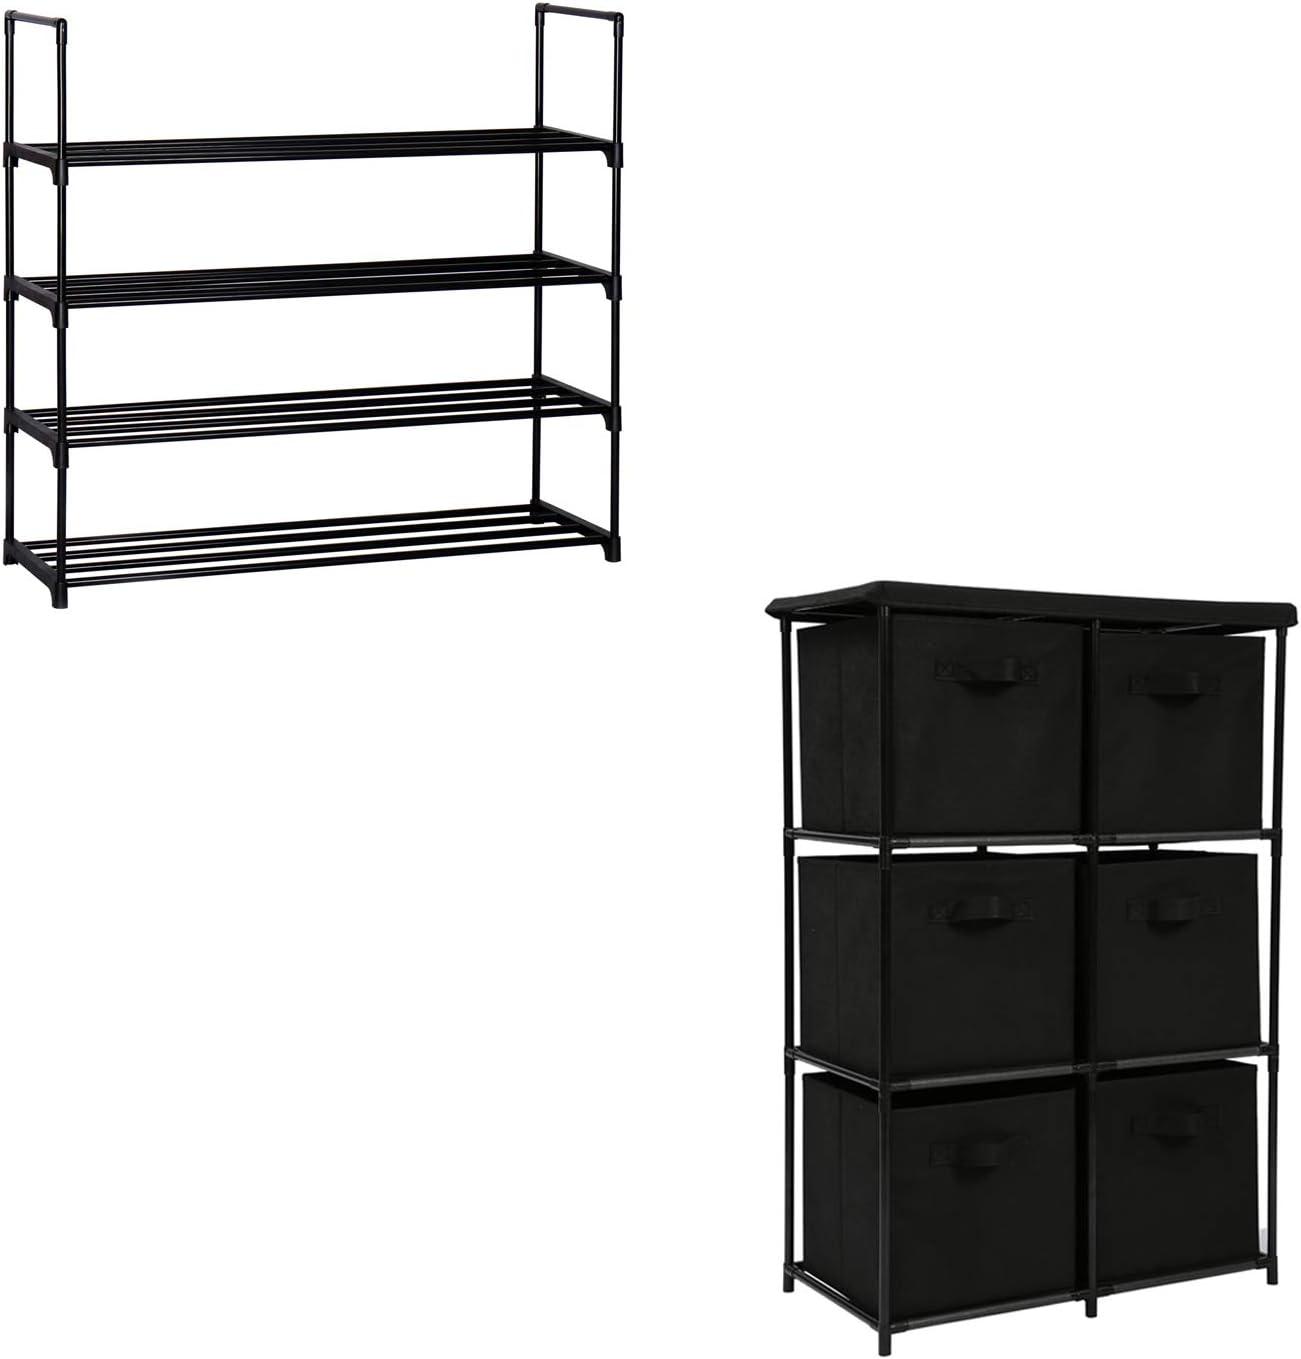 Function Home 4-Tier Shoe Rack & 6 Drawer Storage Organizer